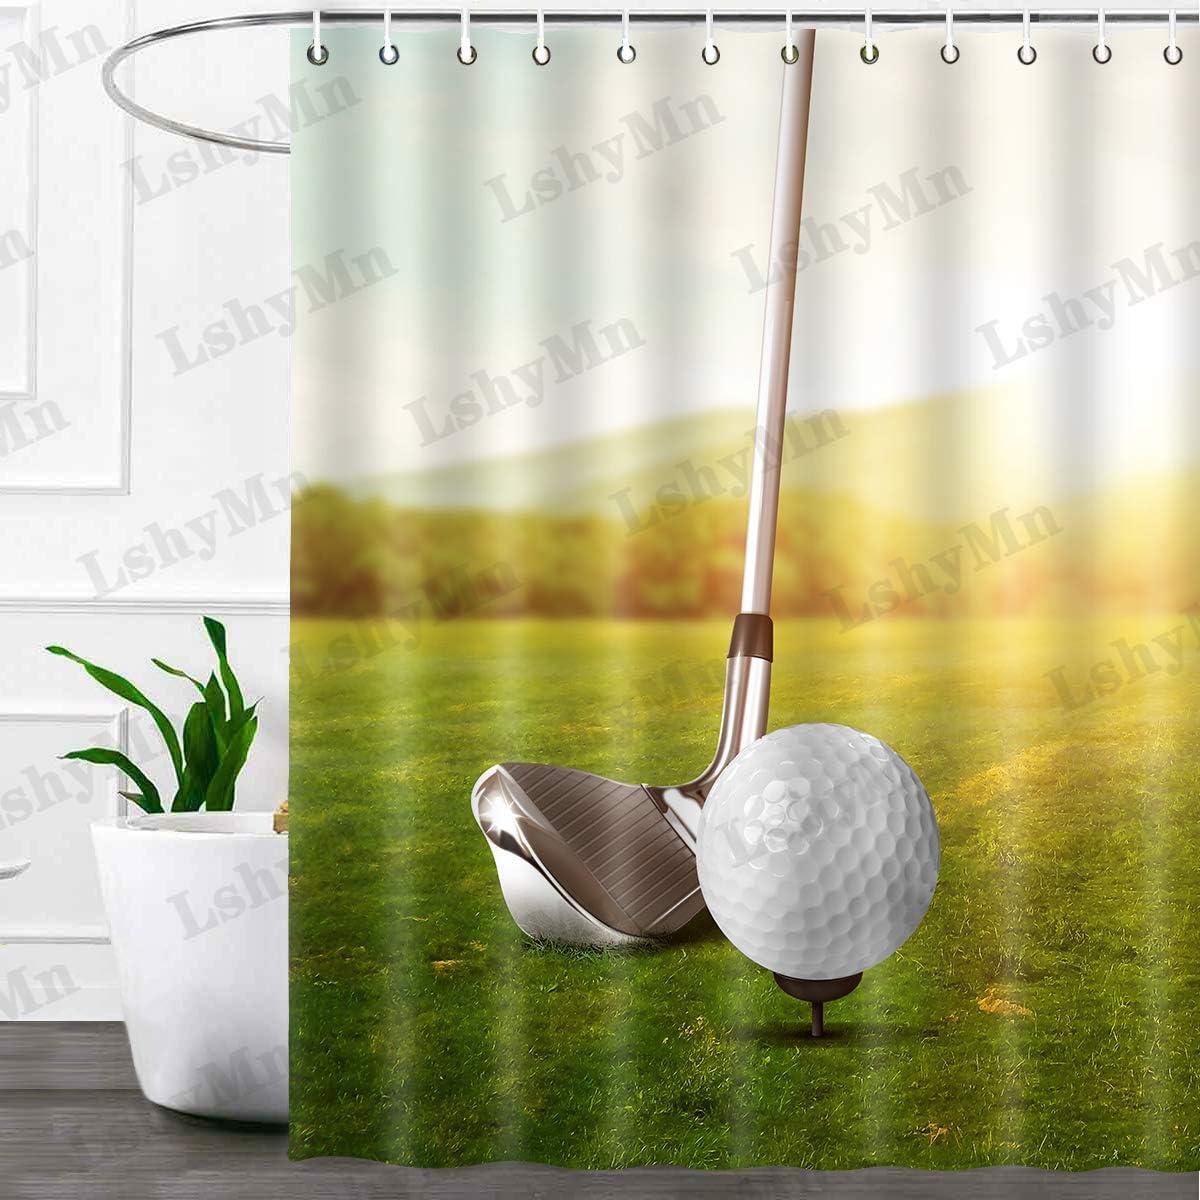 Sports Shower Curtain, Golf Ball Theme Outdoor Sports Shower Curtain Set with Hooks for Bathroom Decor Waterproof Fabric Shower Curtain 72x72 Inches YLSYMN37